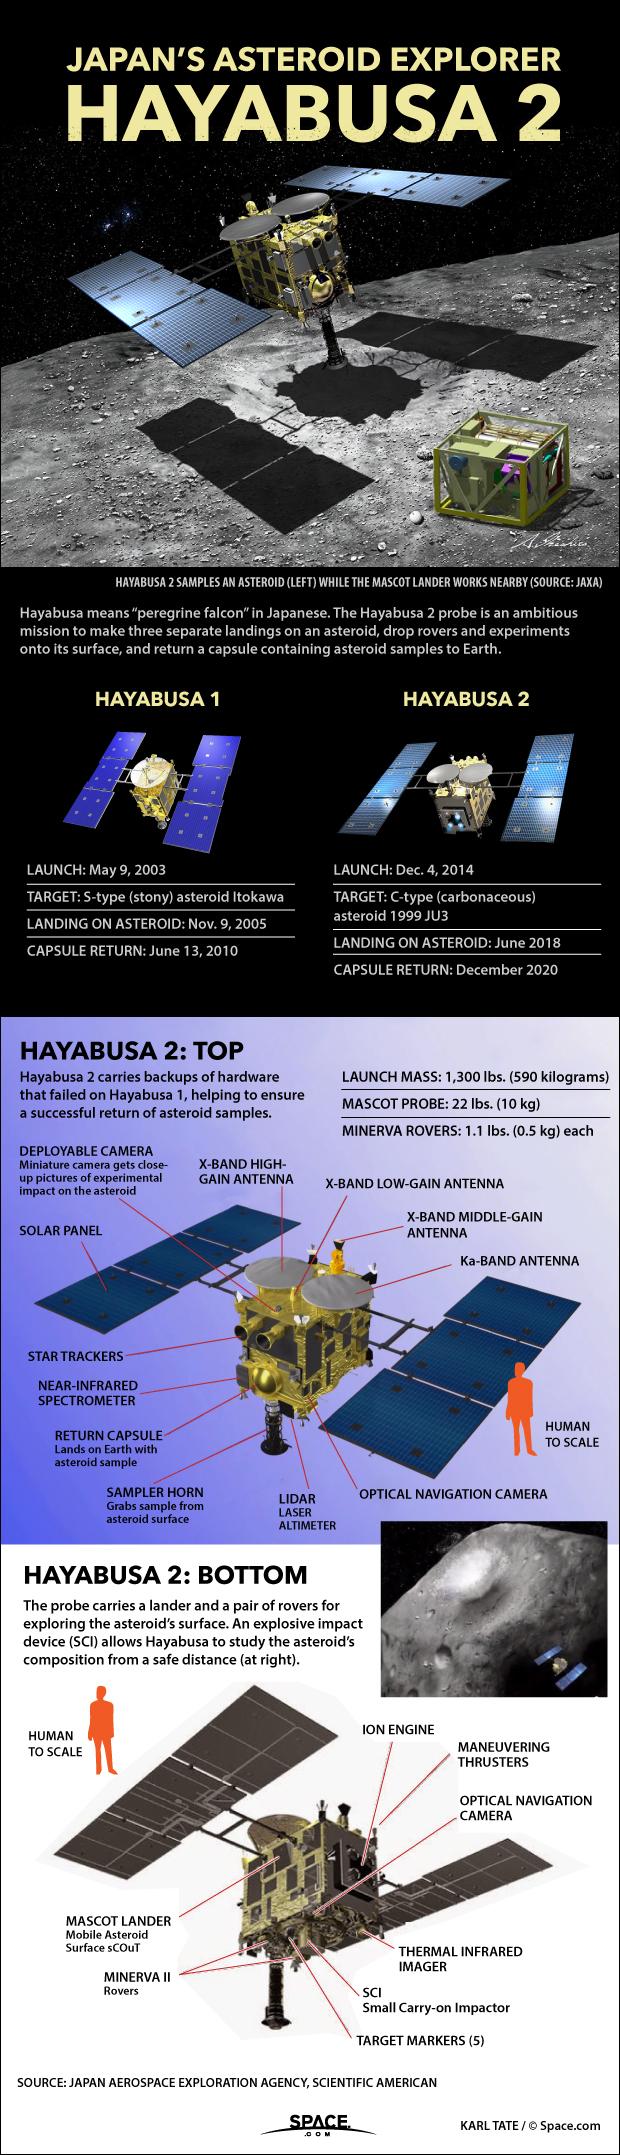 Japan's Hayabusa2 Asteroid Sample-Return Mission Explained (Infographic)